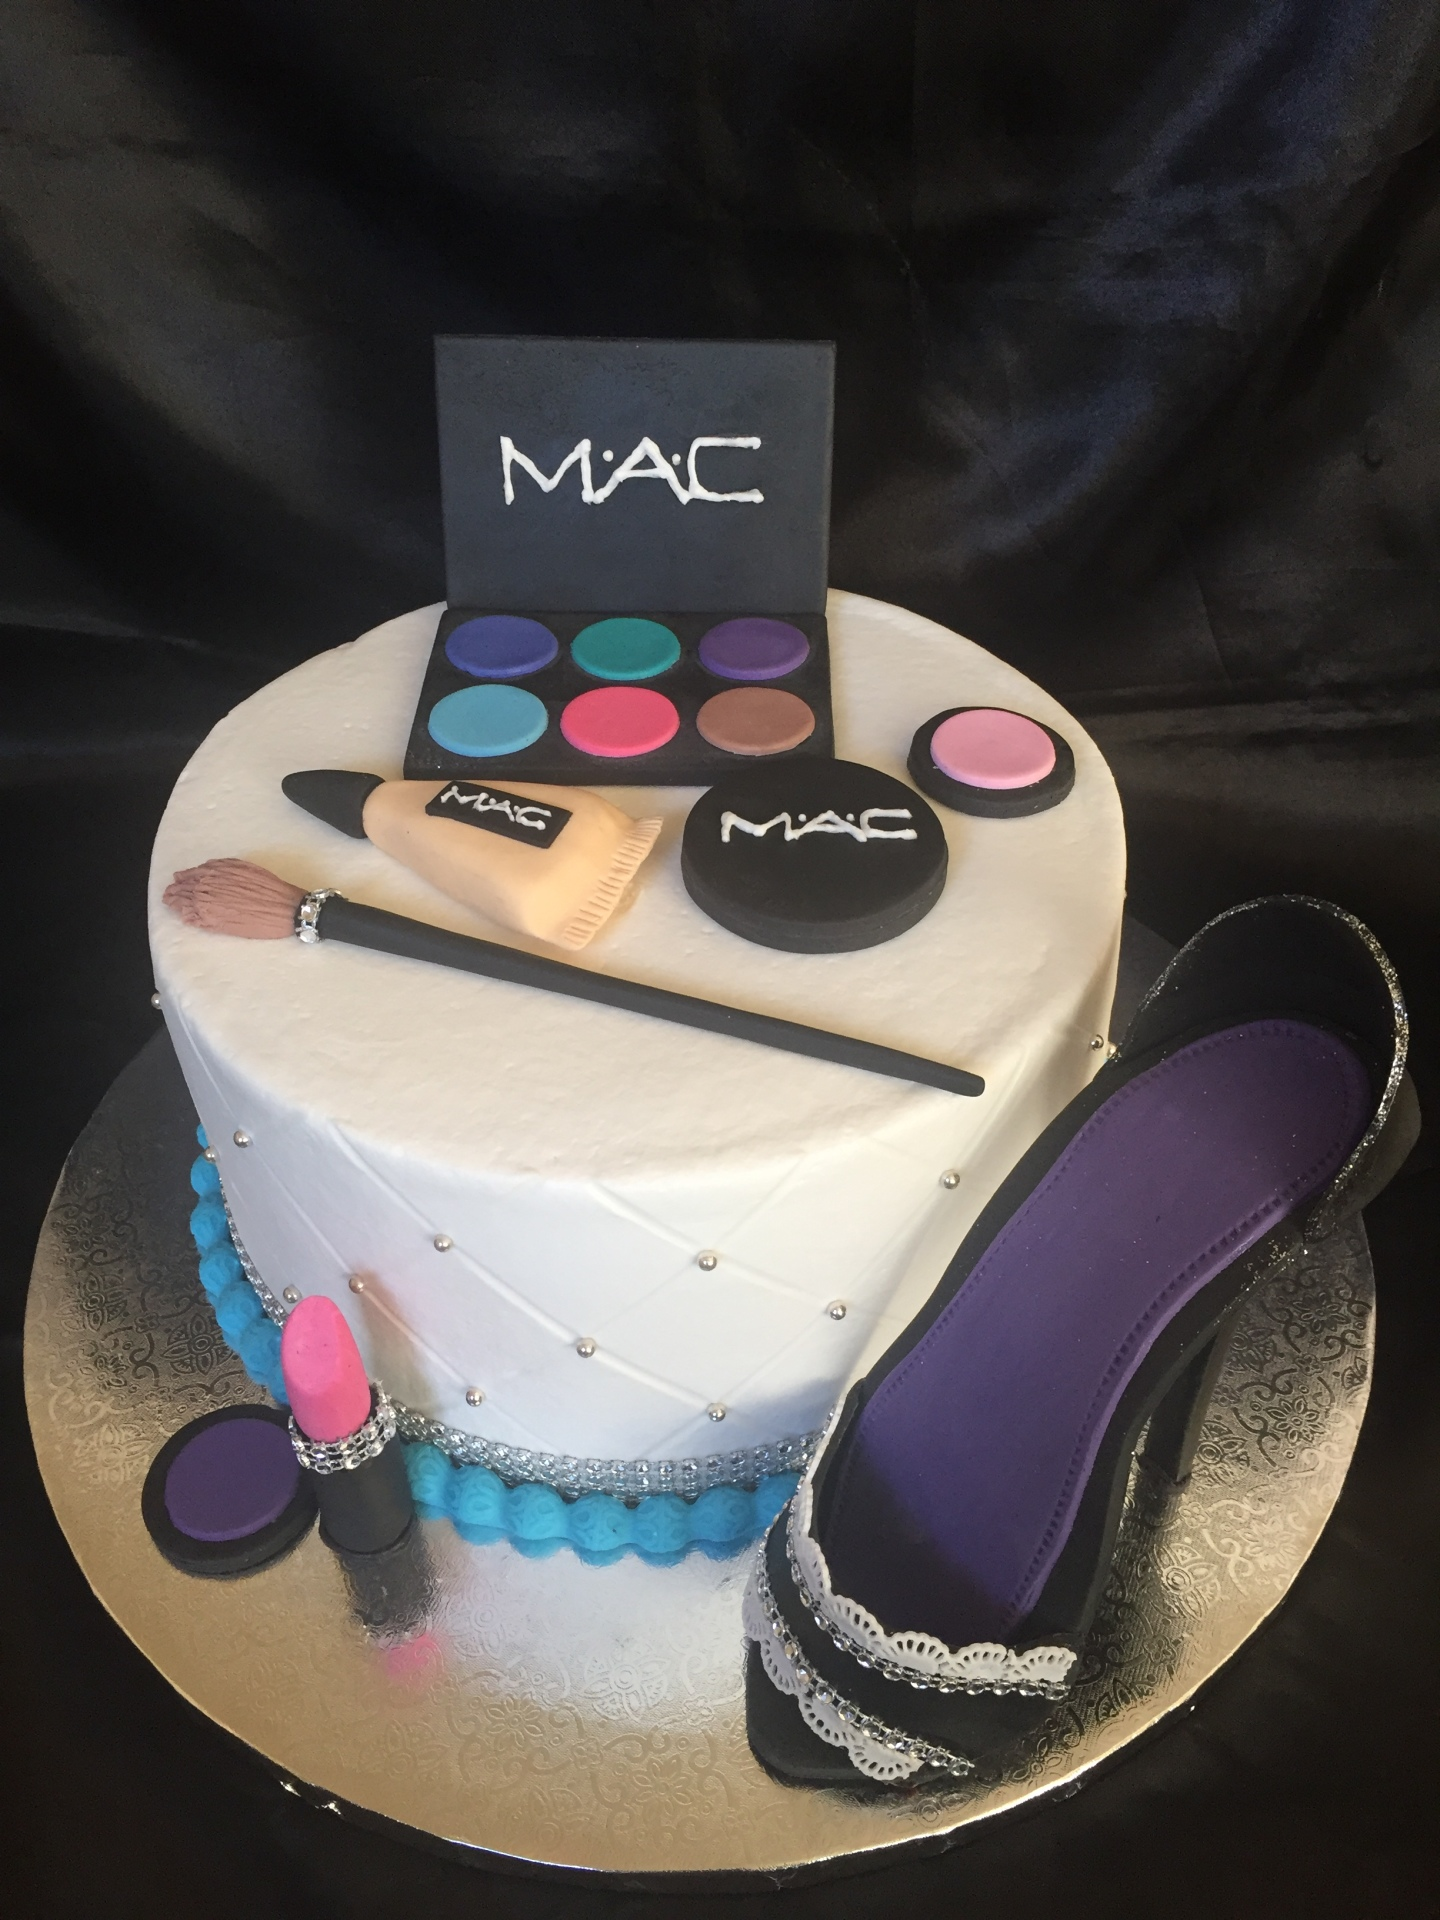 MAC make up and heel